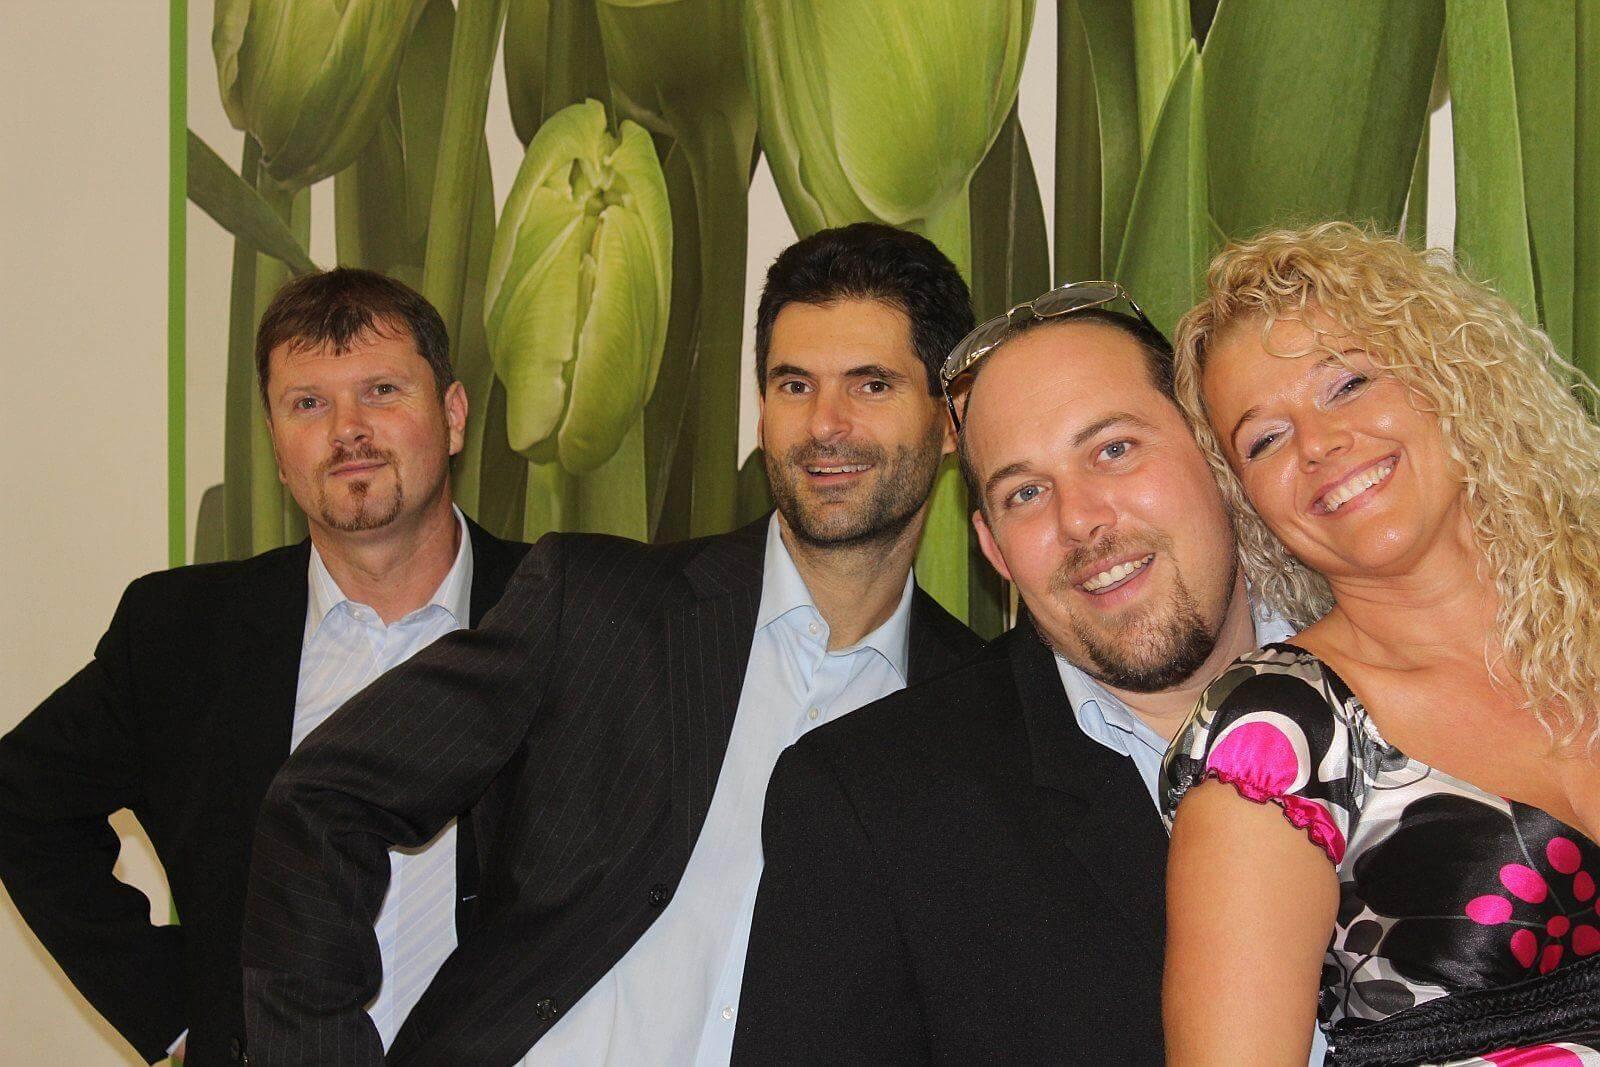 Zenekar Colorband team